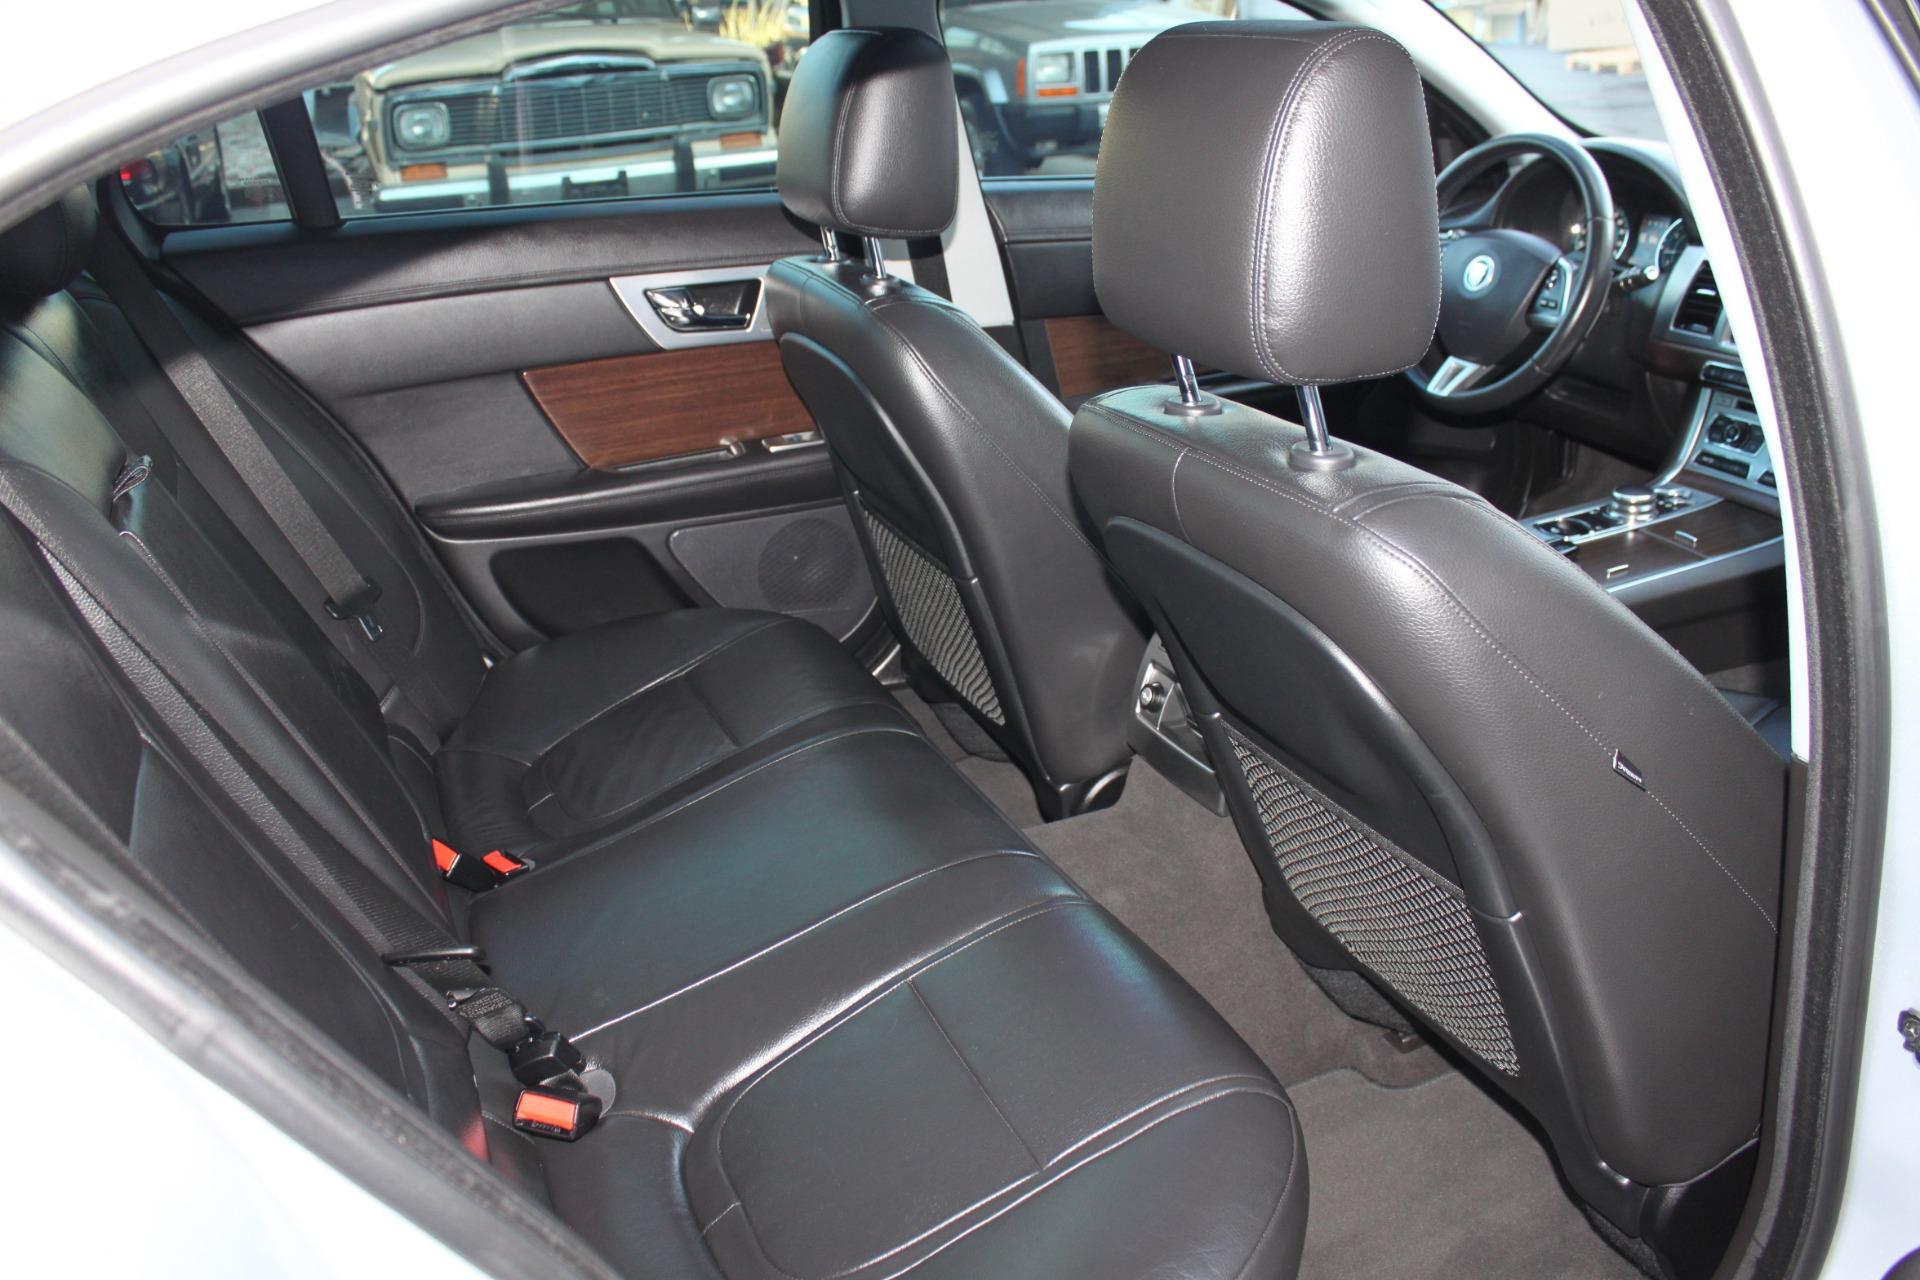 Used-2013-Jaguar-XF-I4-RWD-Wrangler